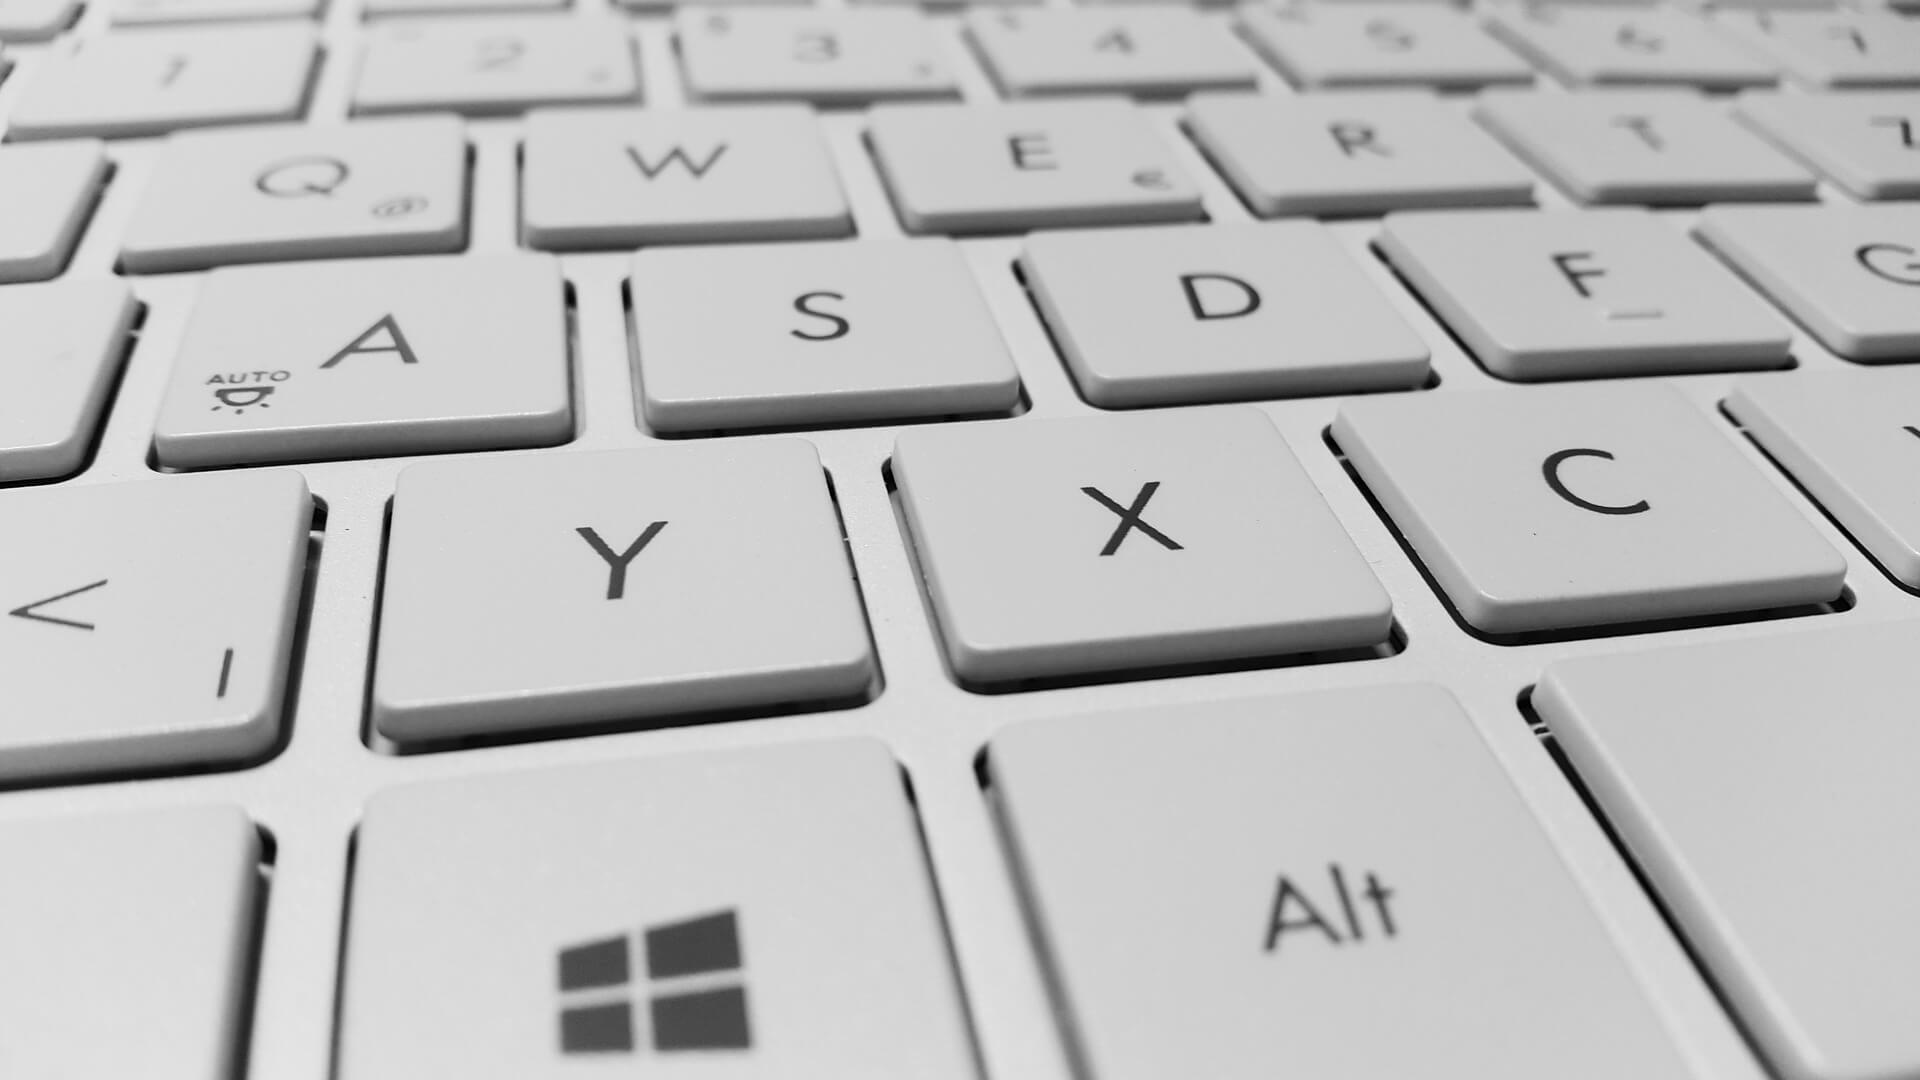 Moderne Tastatur